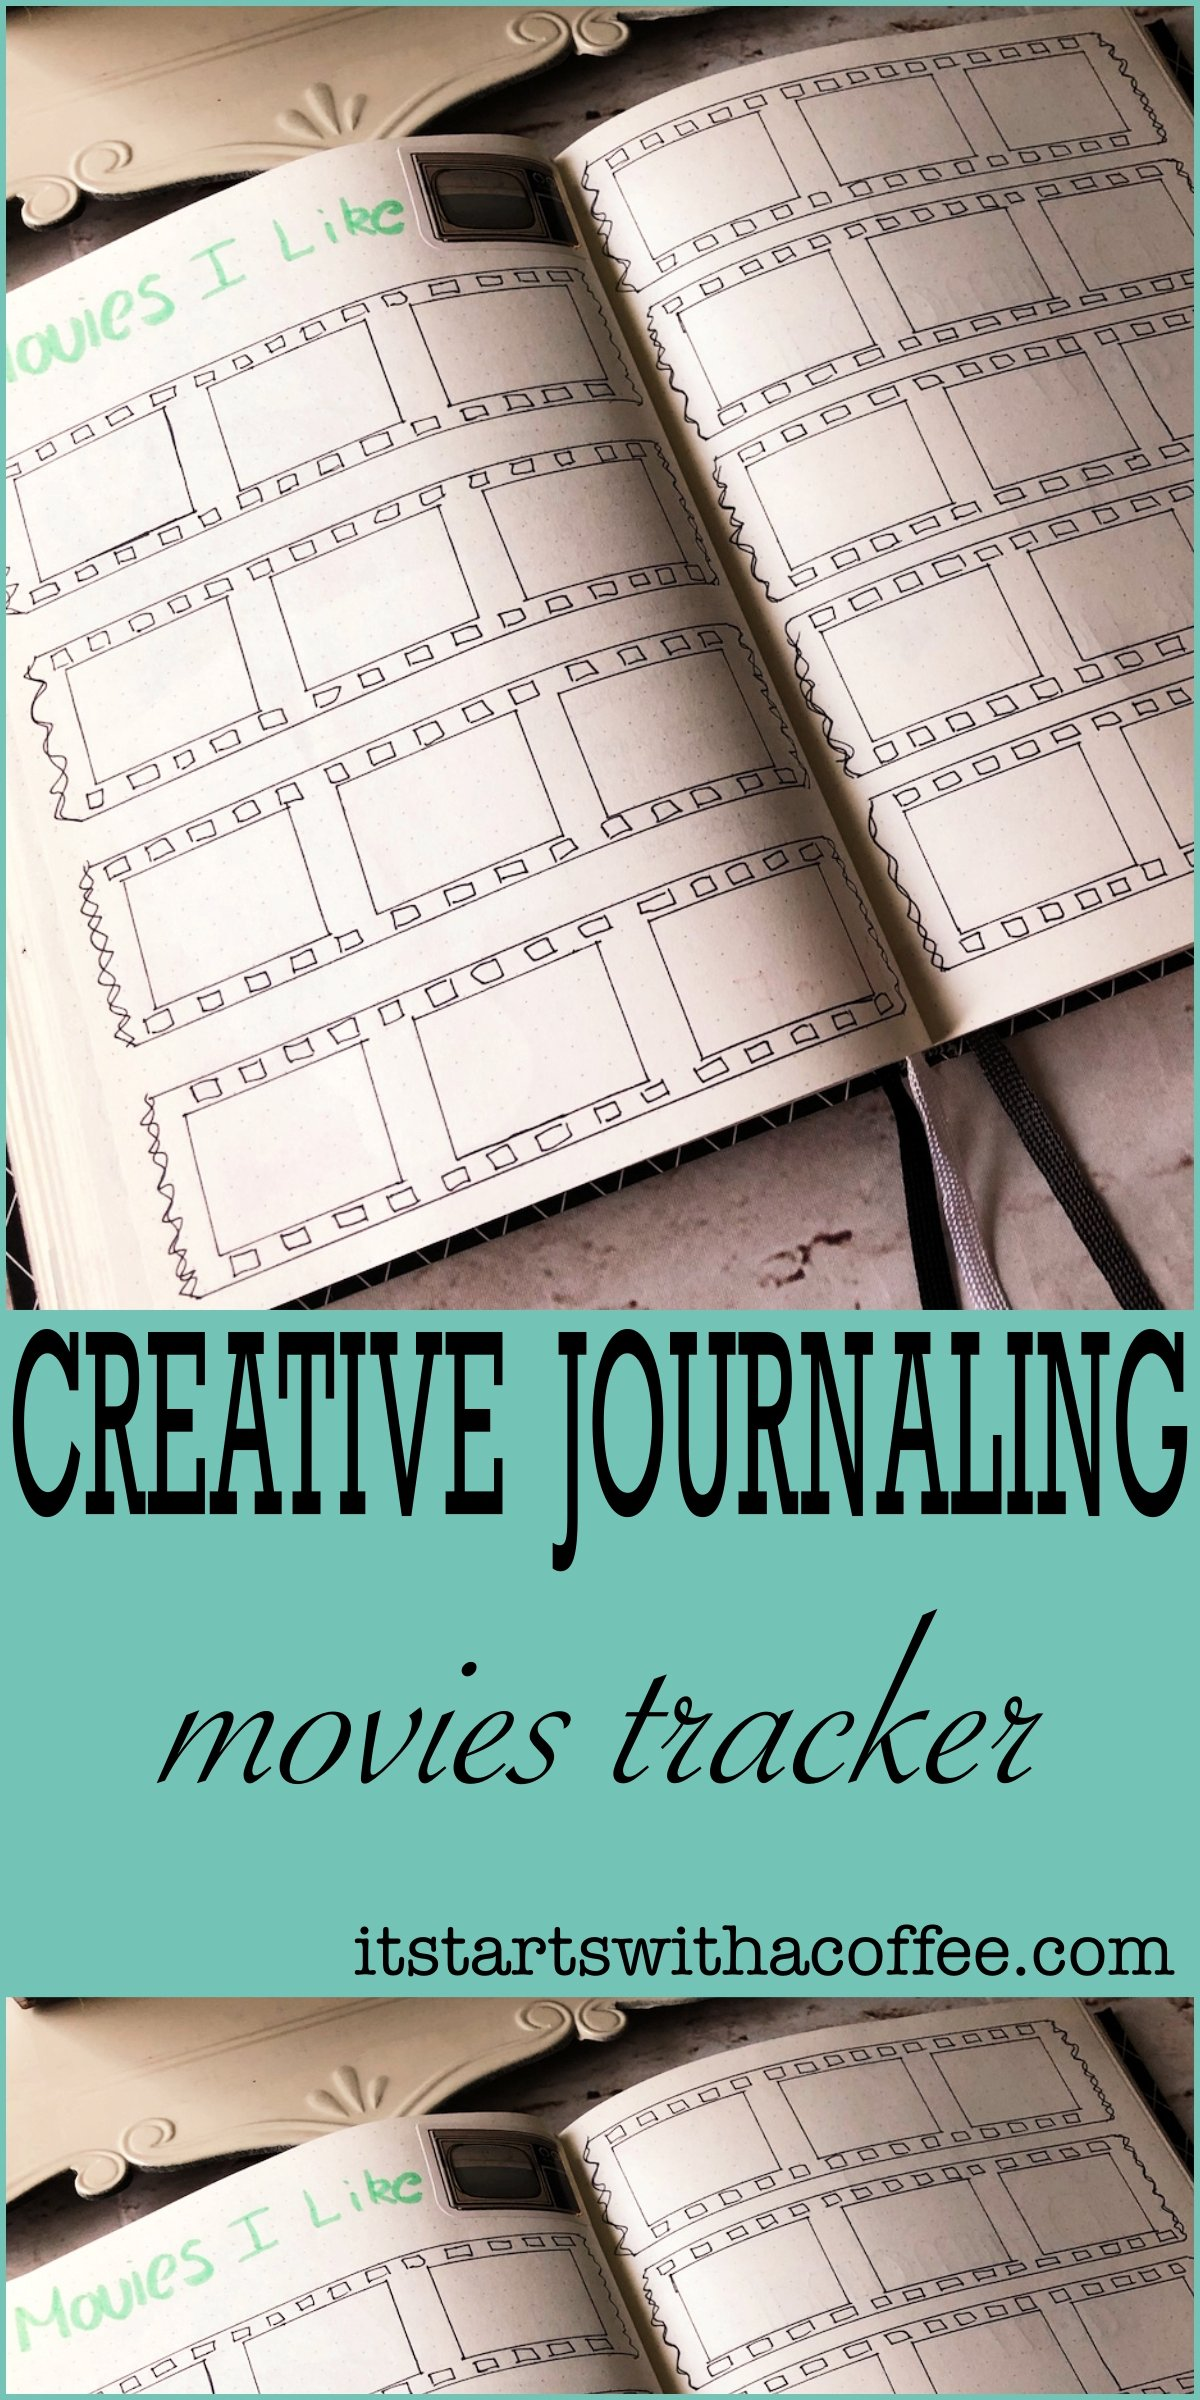 Creative Journaling - Movies I Like - itstartswithacoffee.com #creativejournaling #journaling #tracker #moviestracker